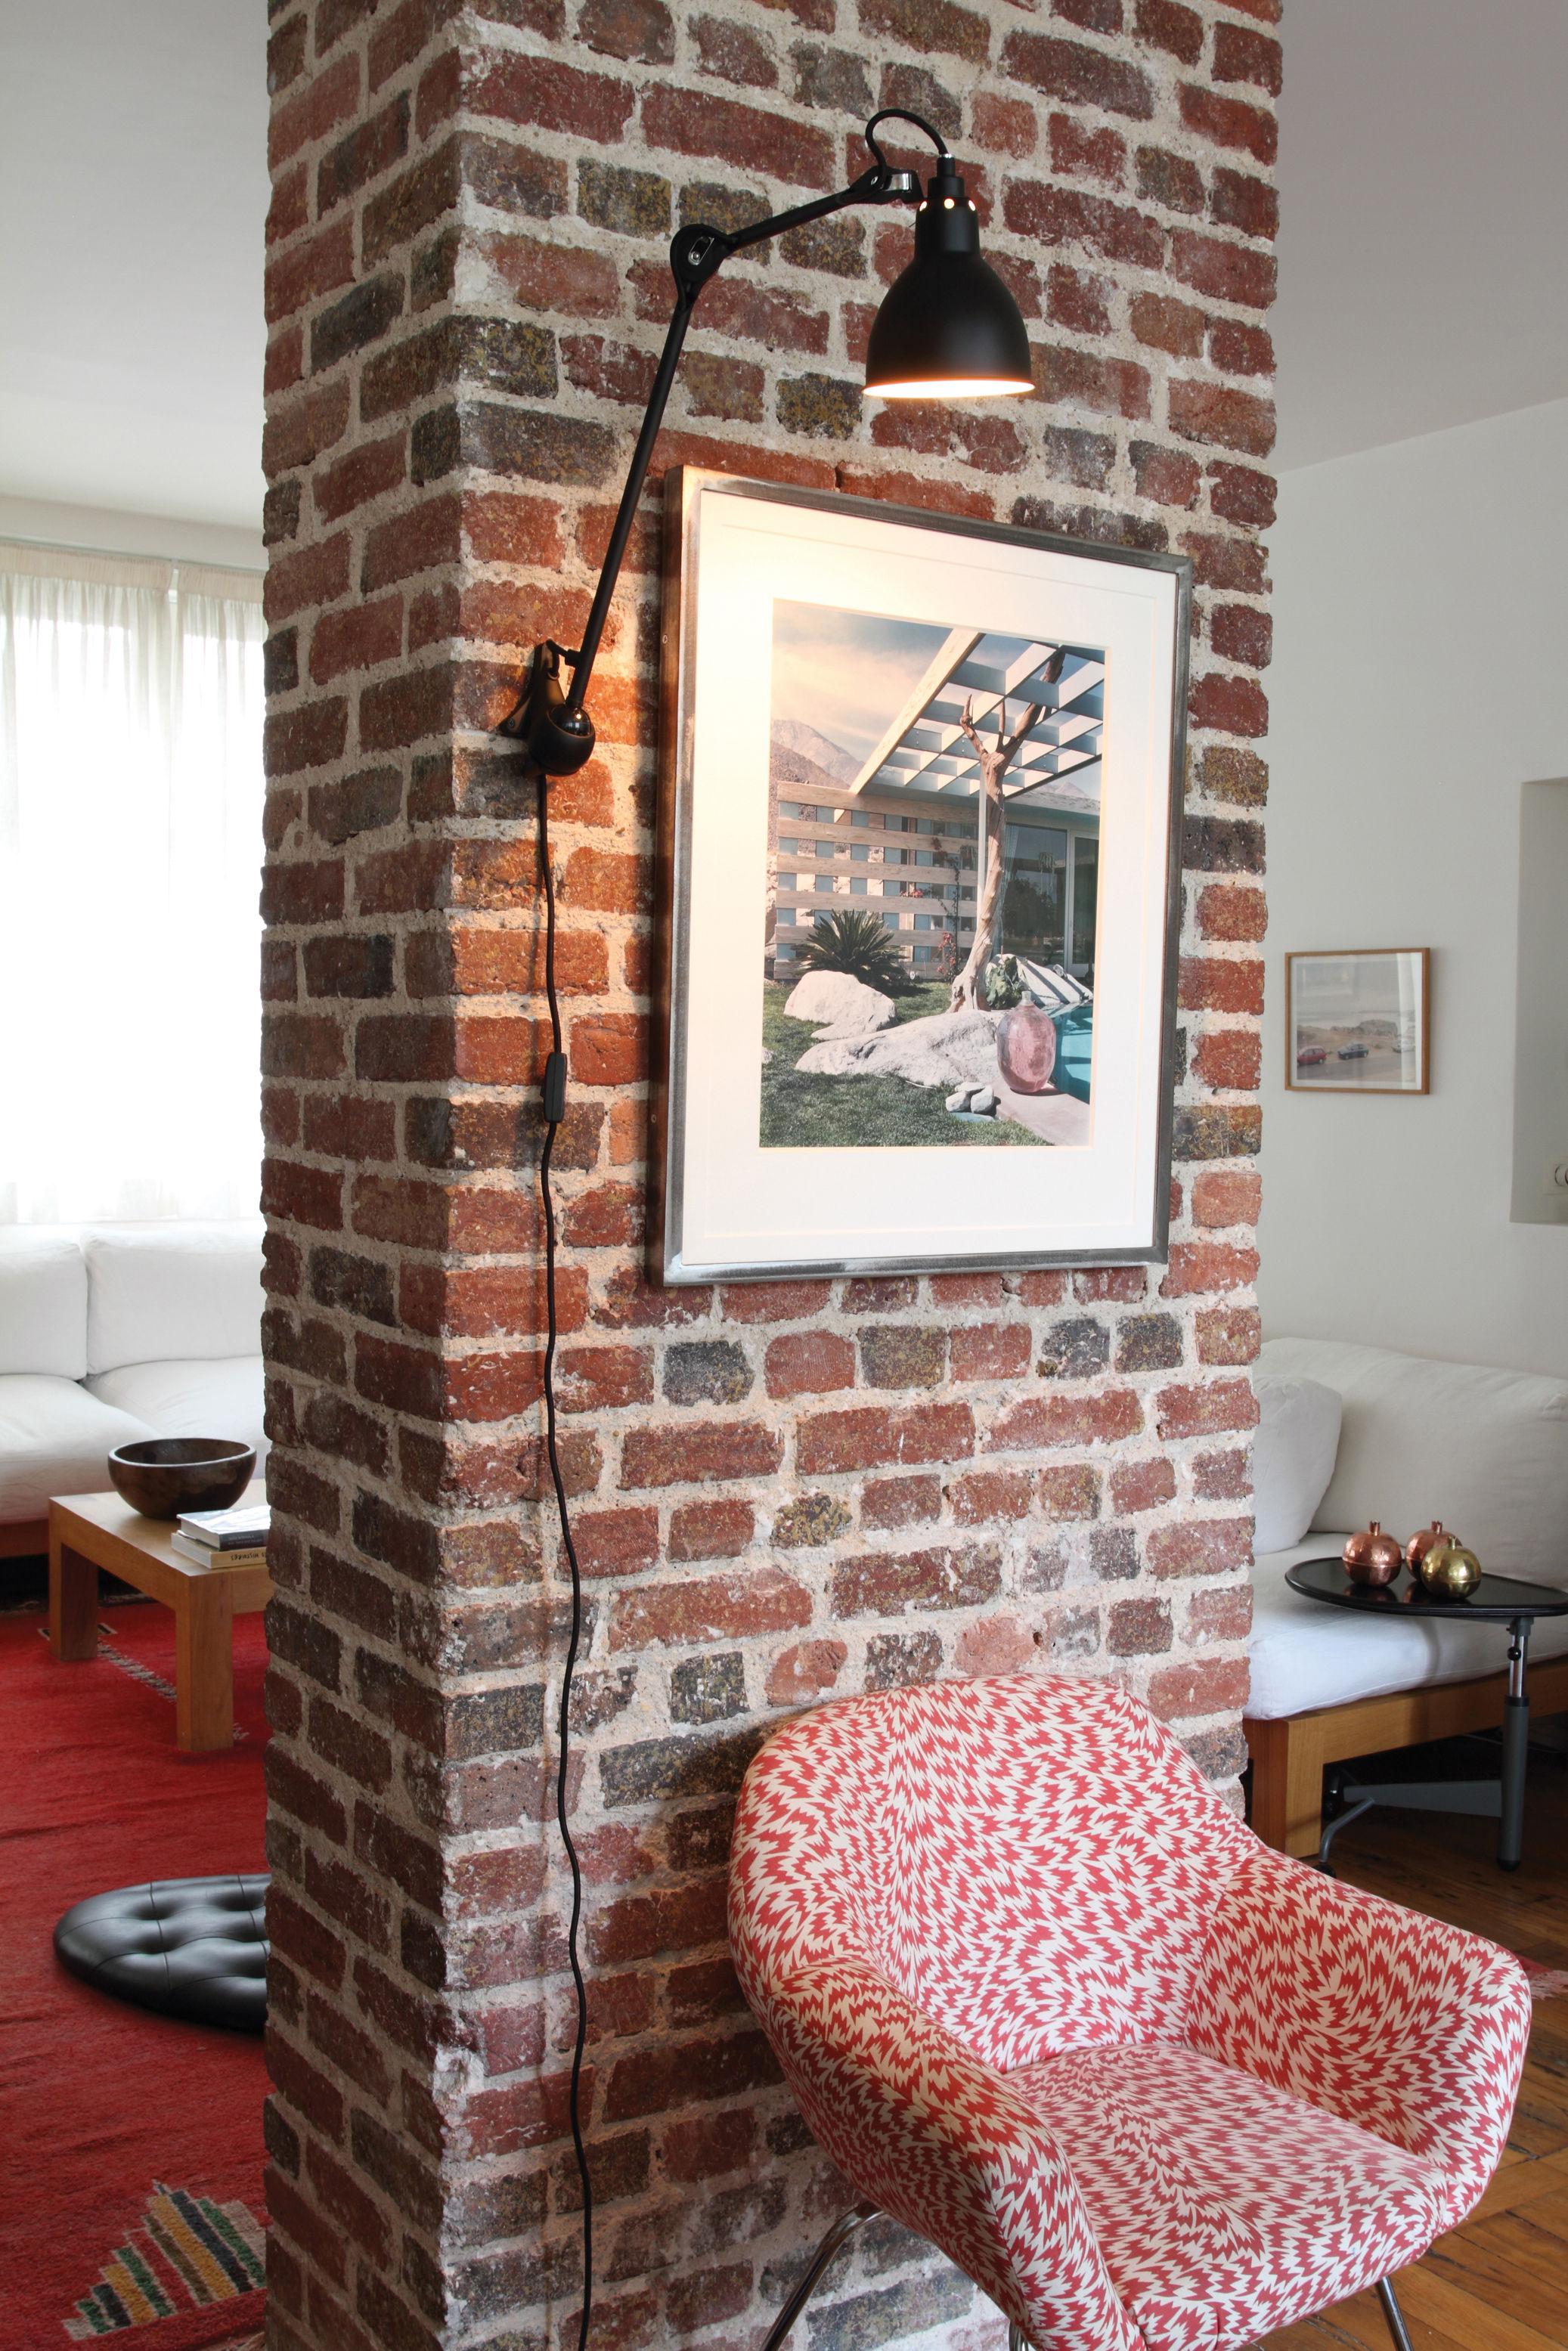 applique n 222 lampe gras noir satin mat dcw ditions made in design. Black Bedroom Furniture Sets. Home Design Ideas